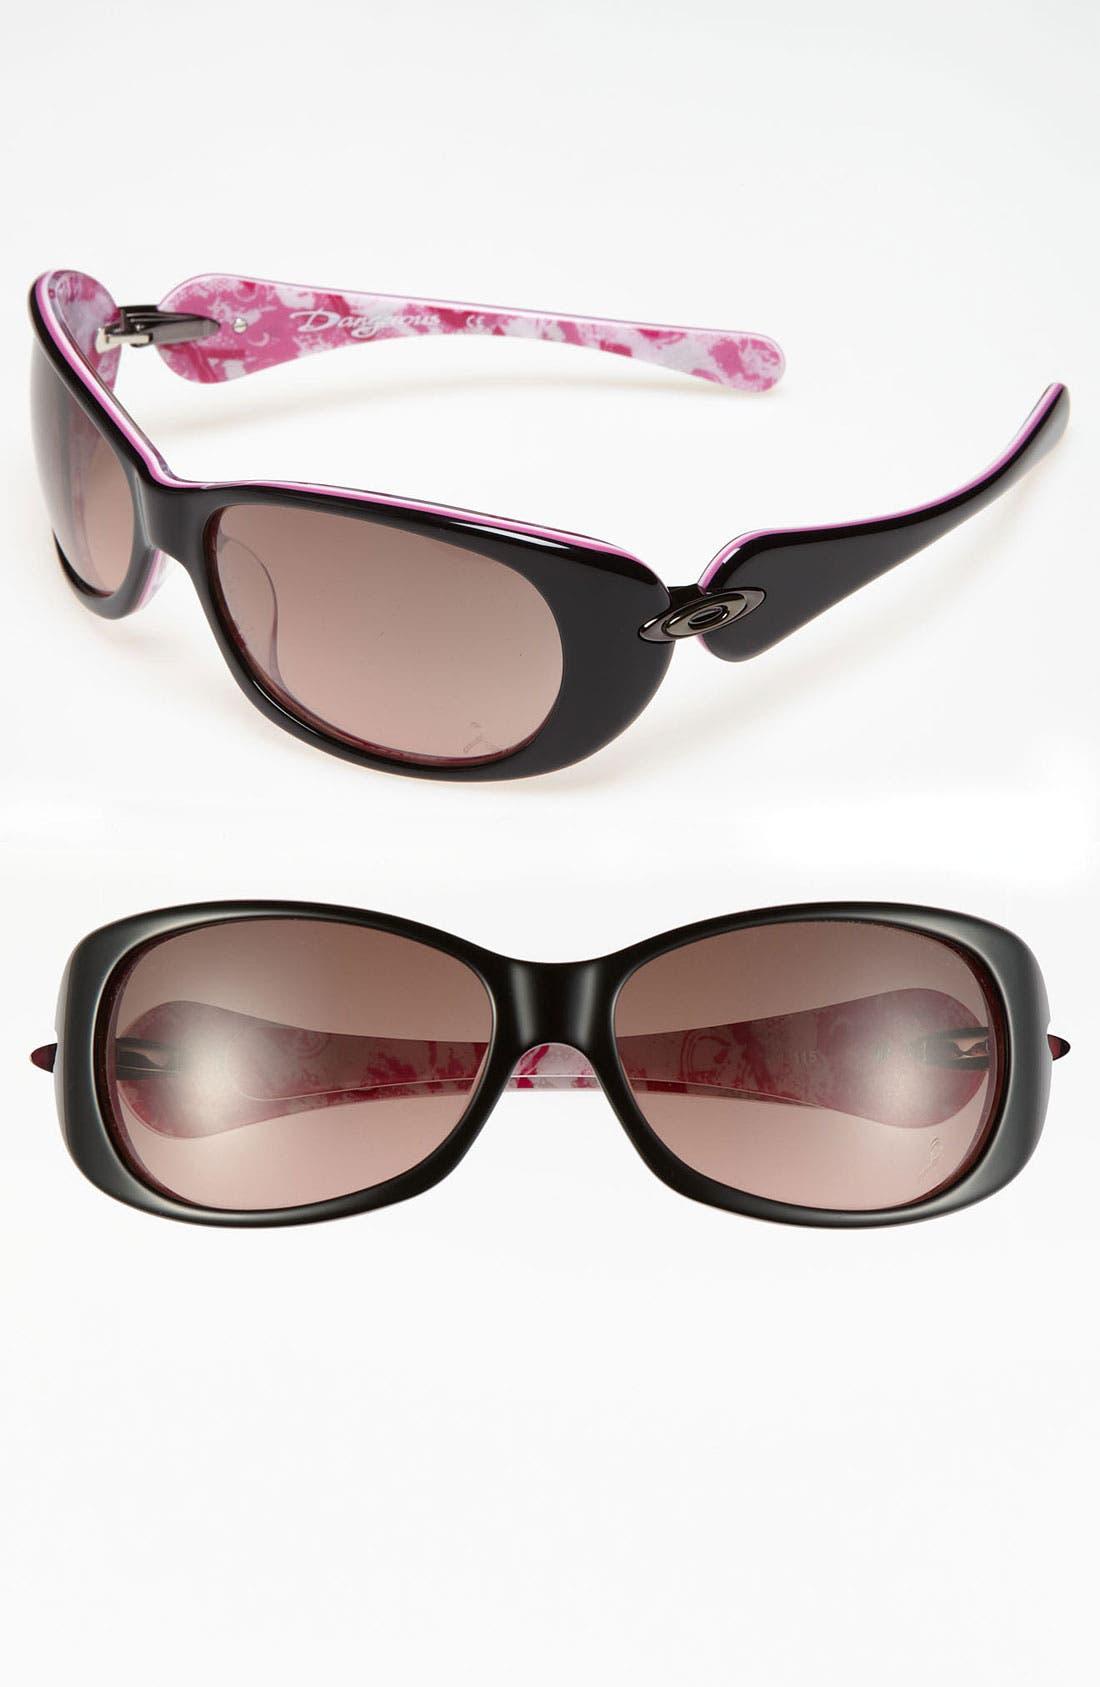 Alternate Image 1 Selected - Oakley 'Dangerous™' - Breast Cancer Awareness Edition' 61mm Sunglasses